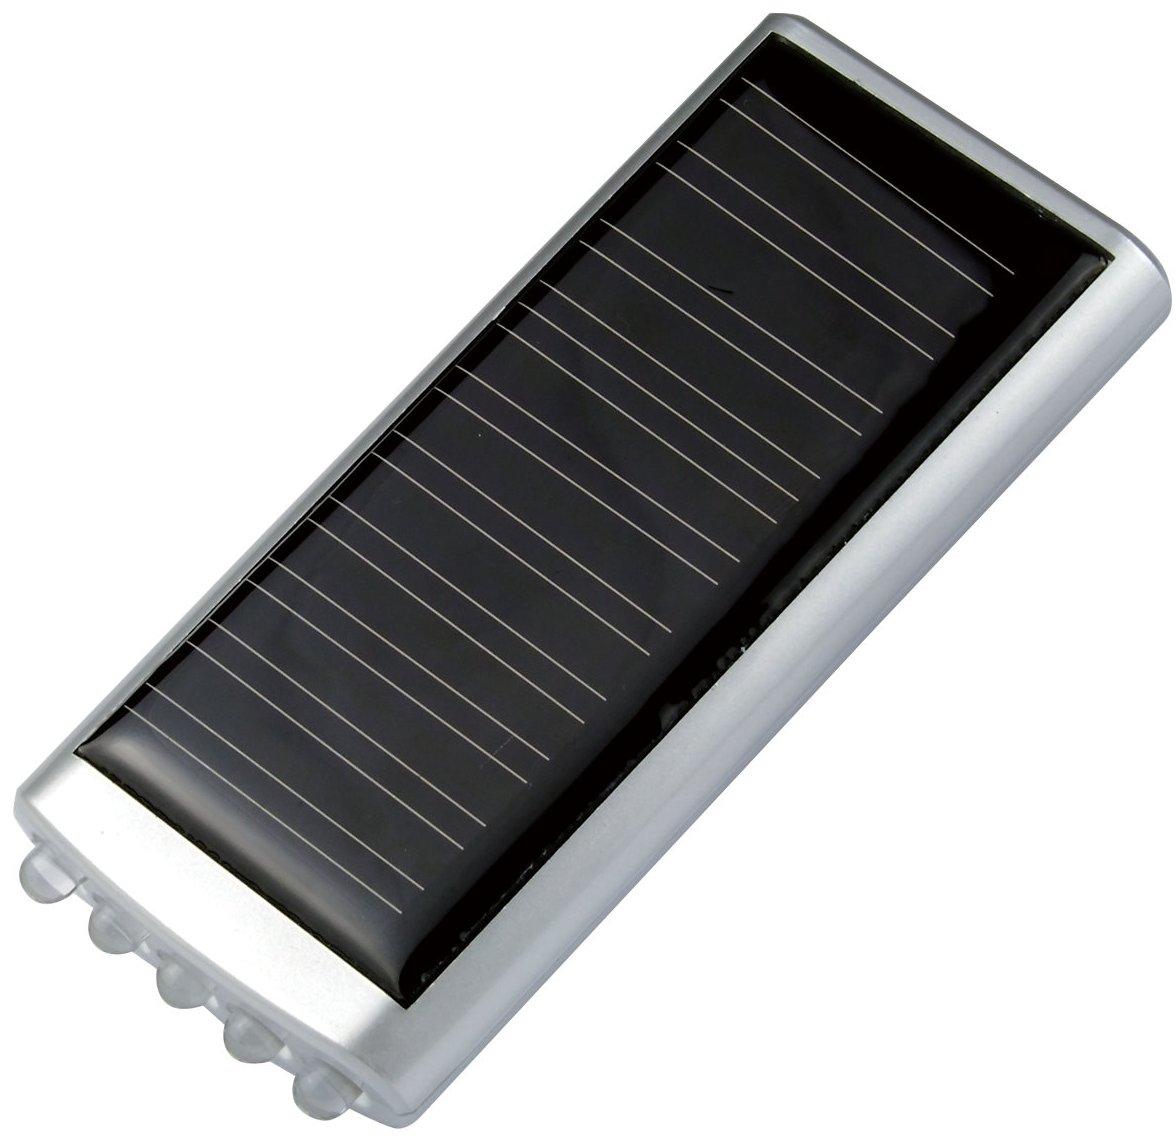 Универсальное зарядное устройство на солнечных батареях для Sony NWZ-B162F Agestar AS-7860 поможет зарядить ваш MP3...